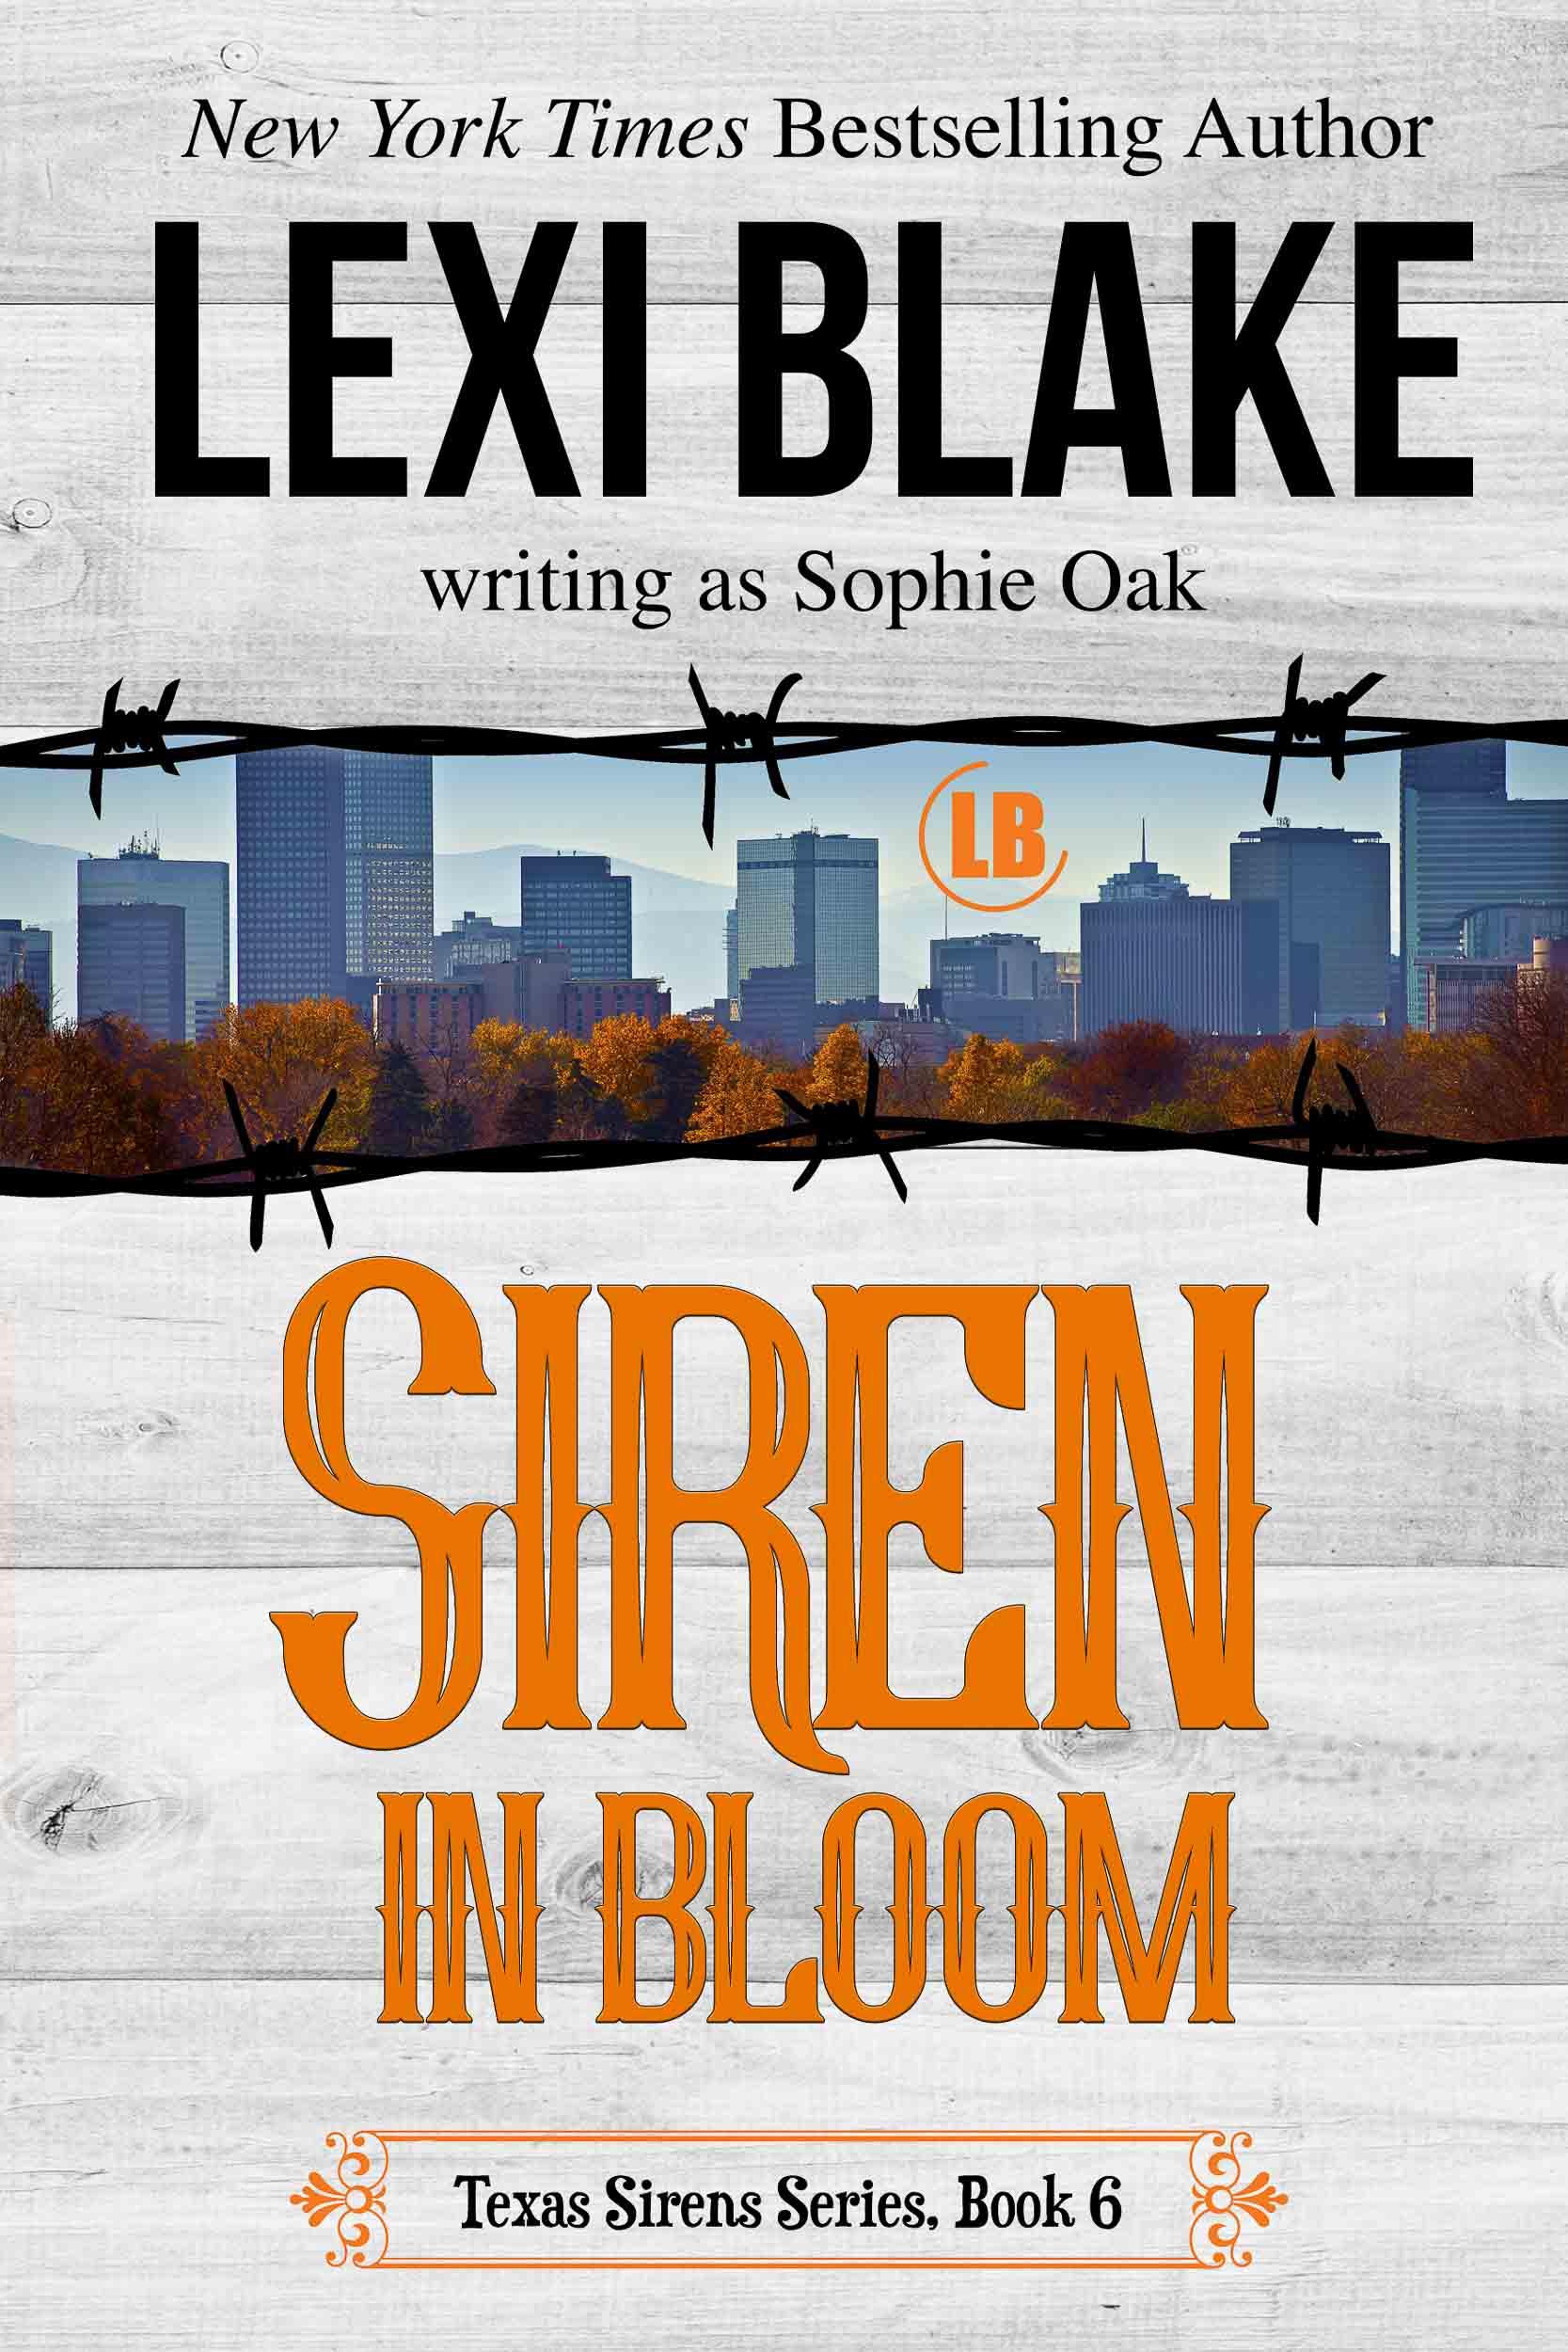 Lexi Blake Siren in Bloom.jpg